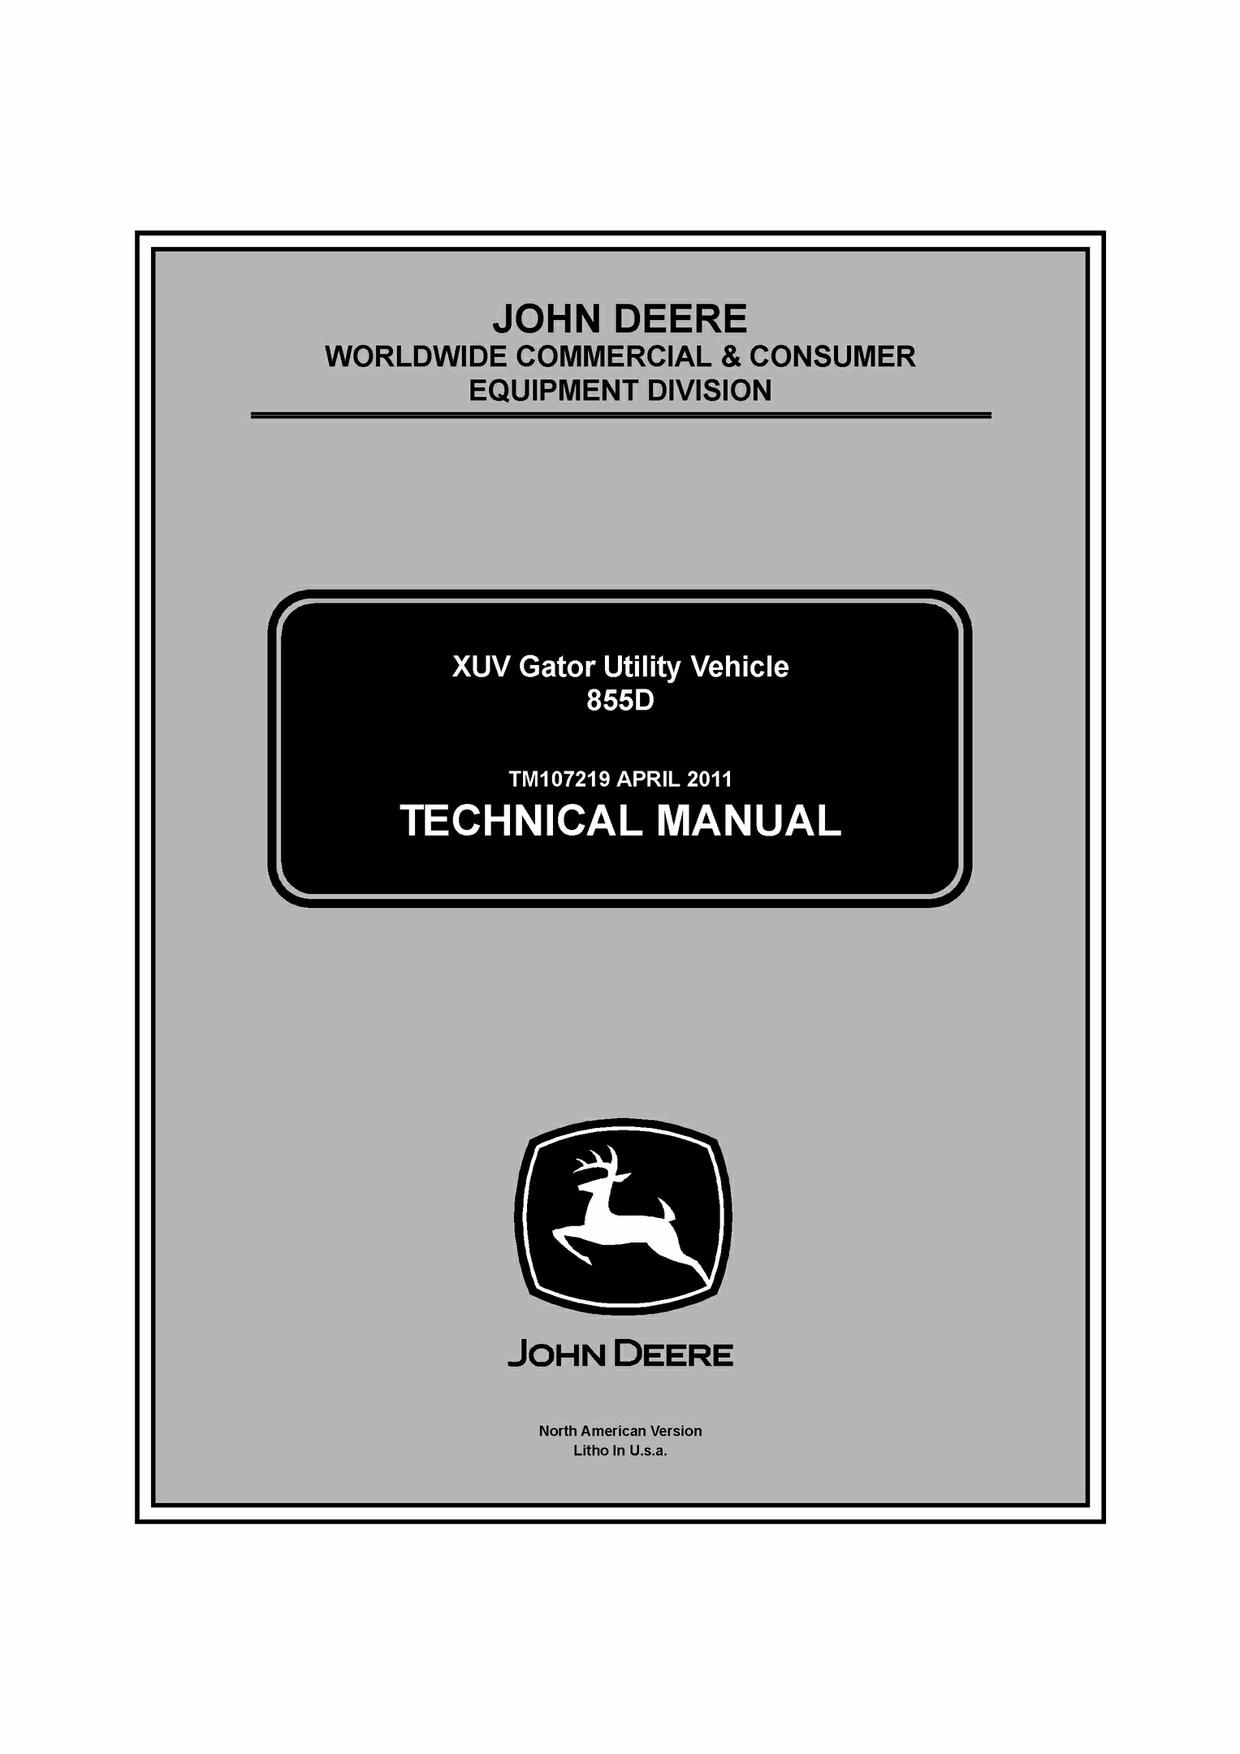 John Deere 855D XUV Gator Utility Vehicle Repair Service Technical Manual TM107219